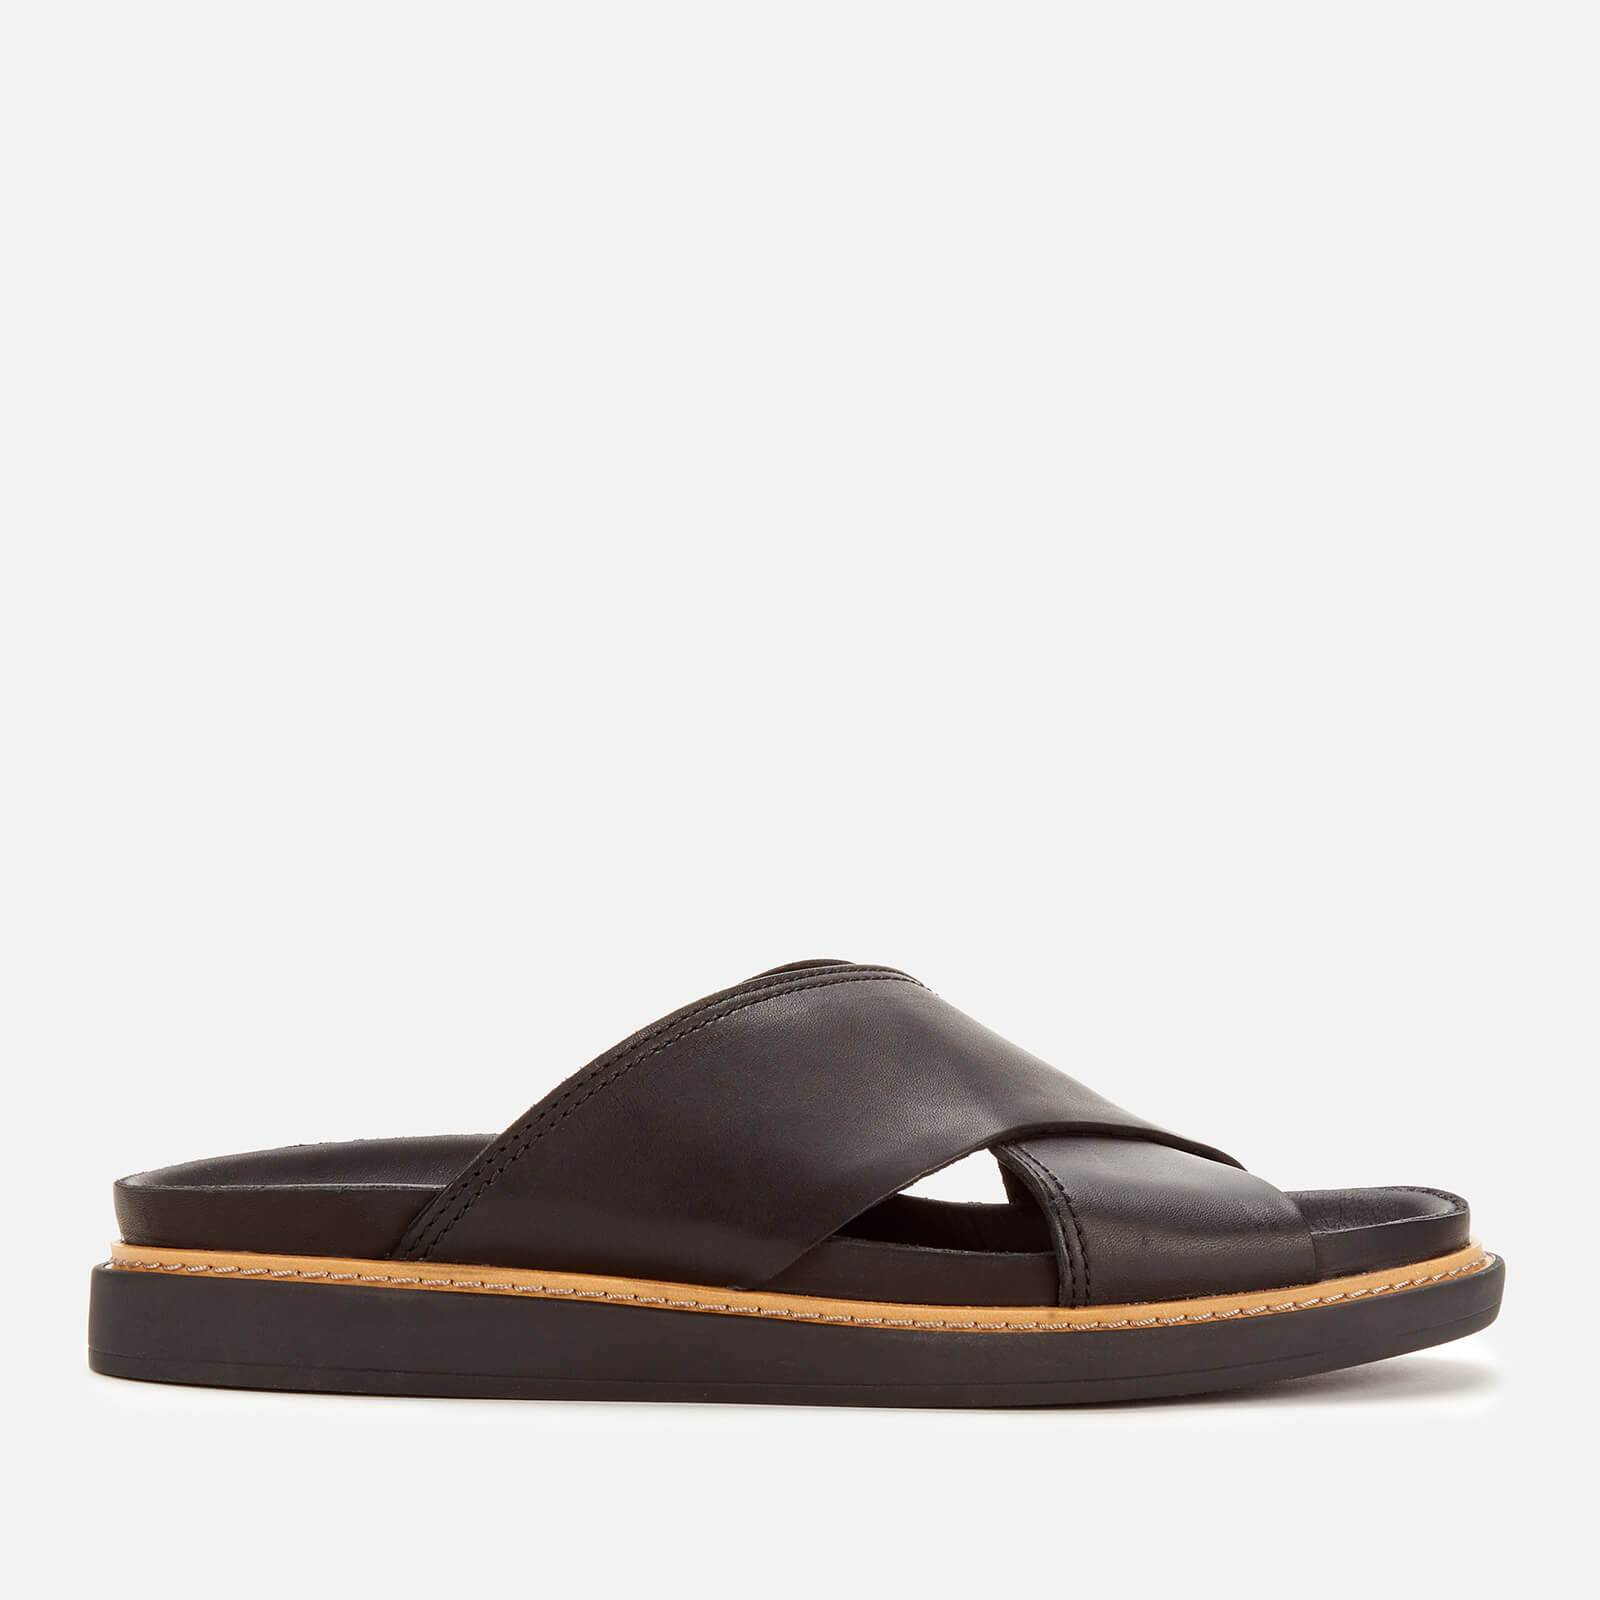 Clarks Women's Trace Drift Leather Cross Front Sandals - Black - UK 3 - Black